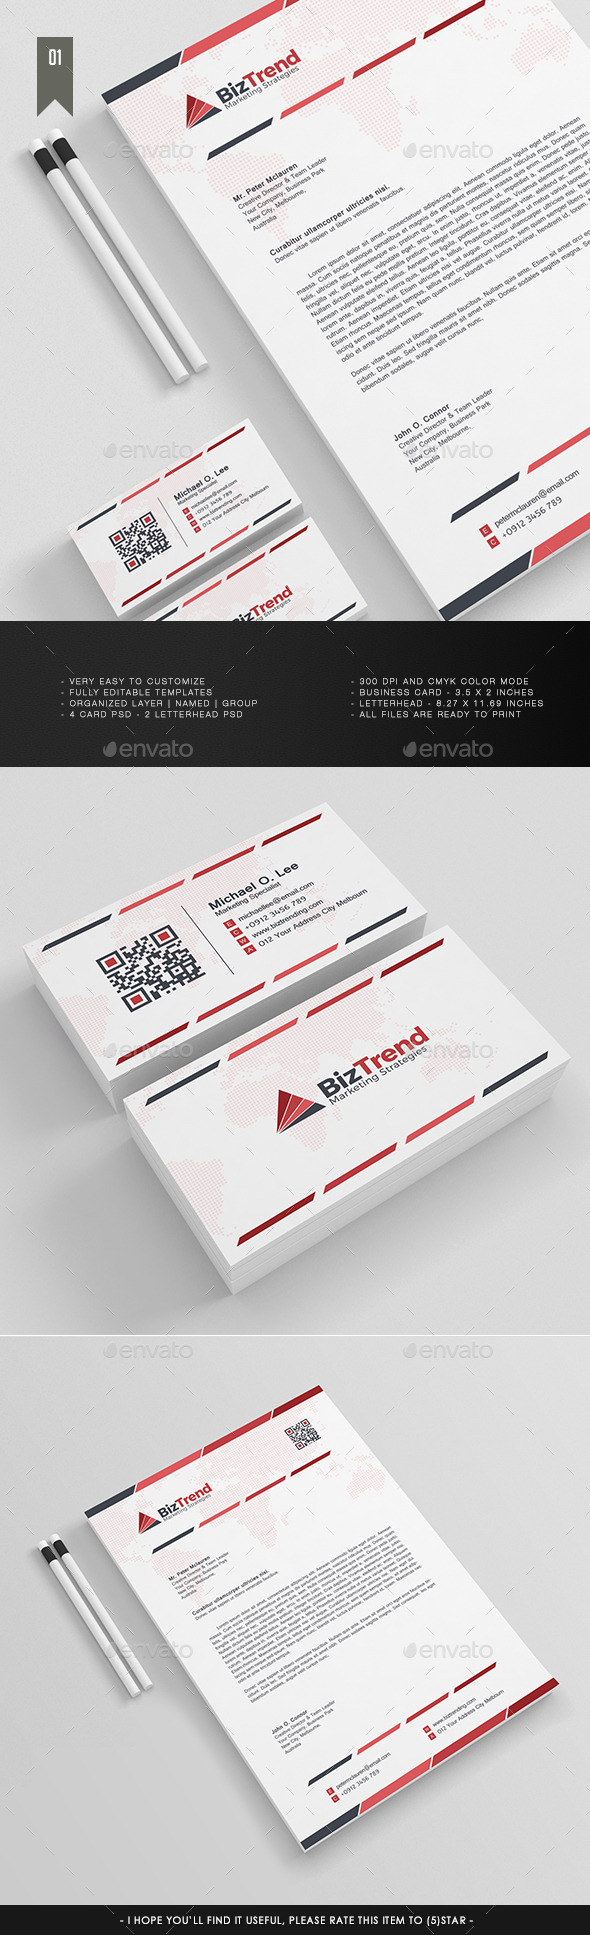 Letterhead & Business Card V.1 - Stationery Print Templates